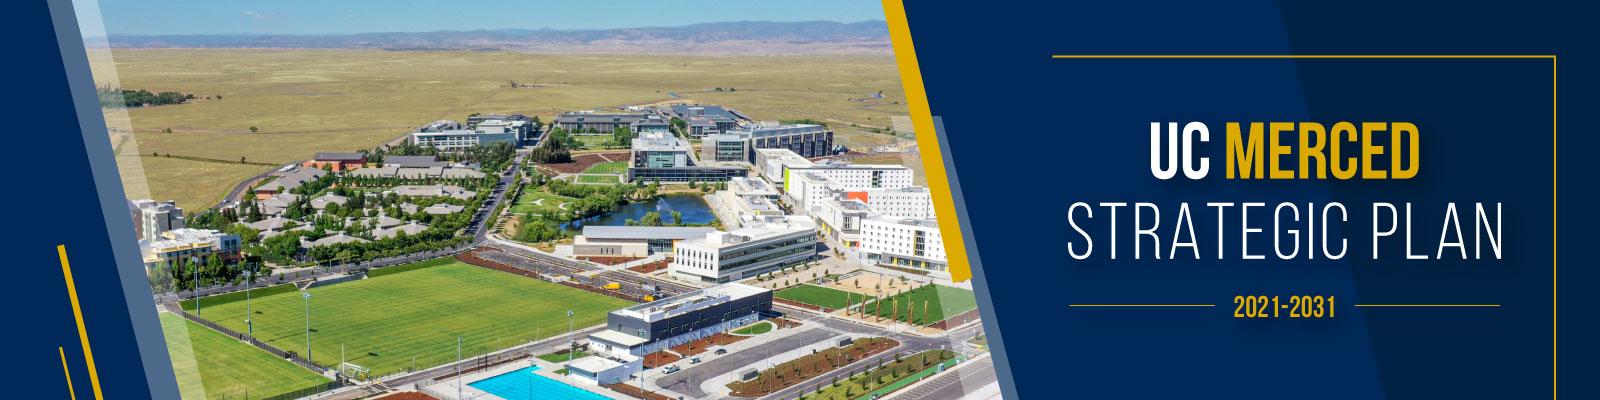 campus arial photo uc merced strategic plan 2021-2031